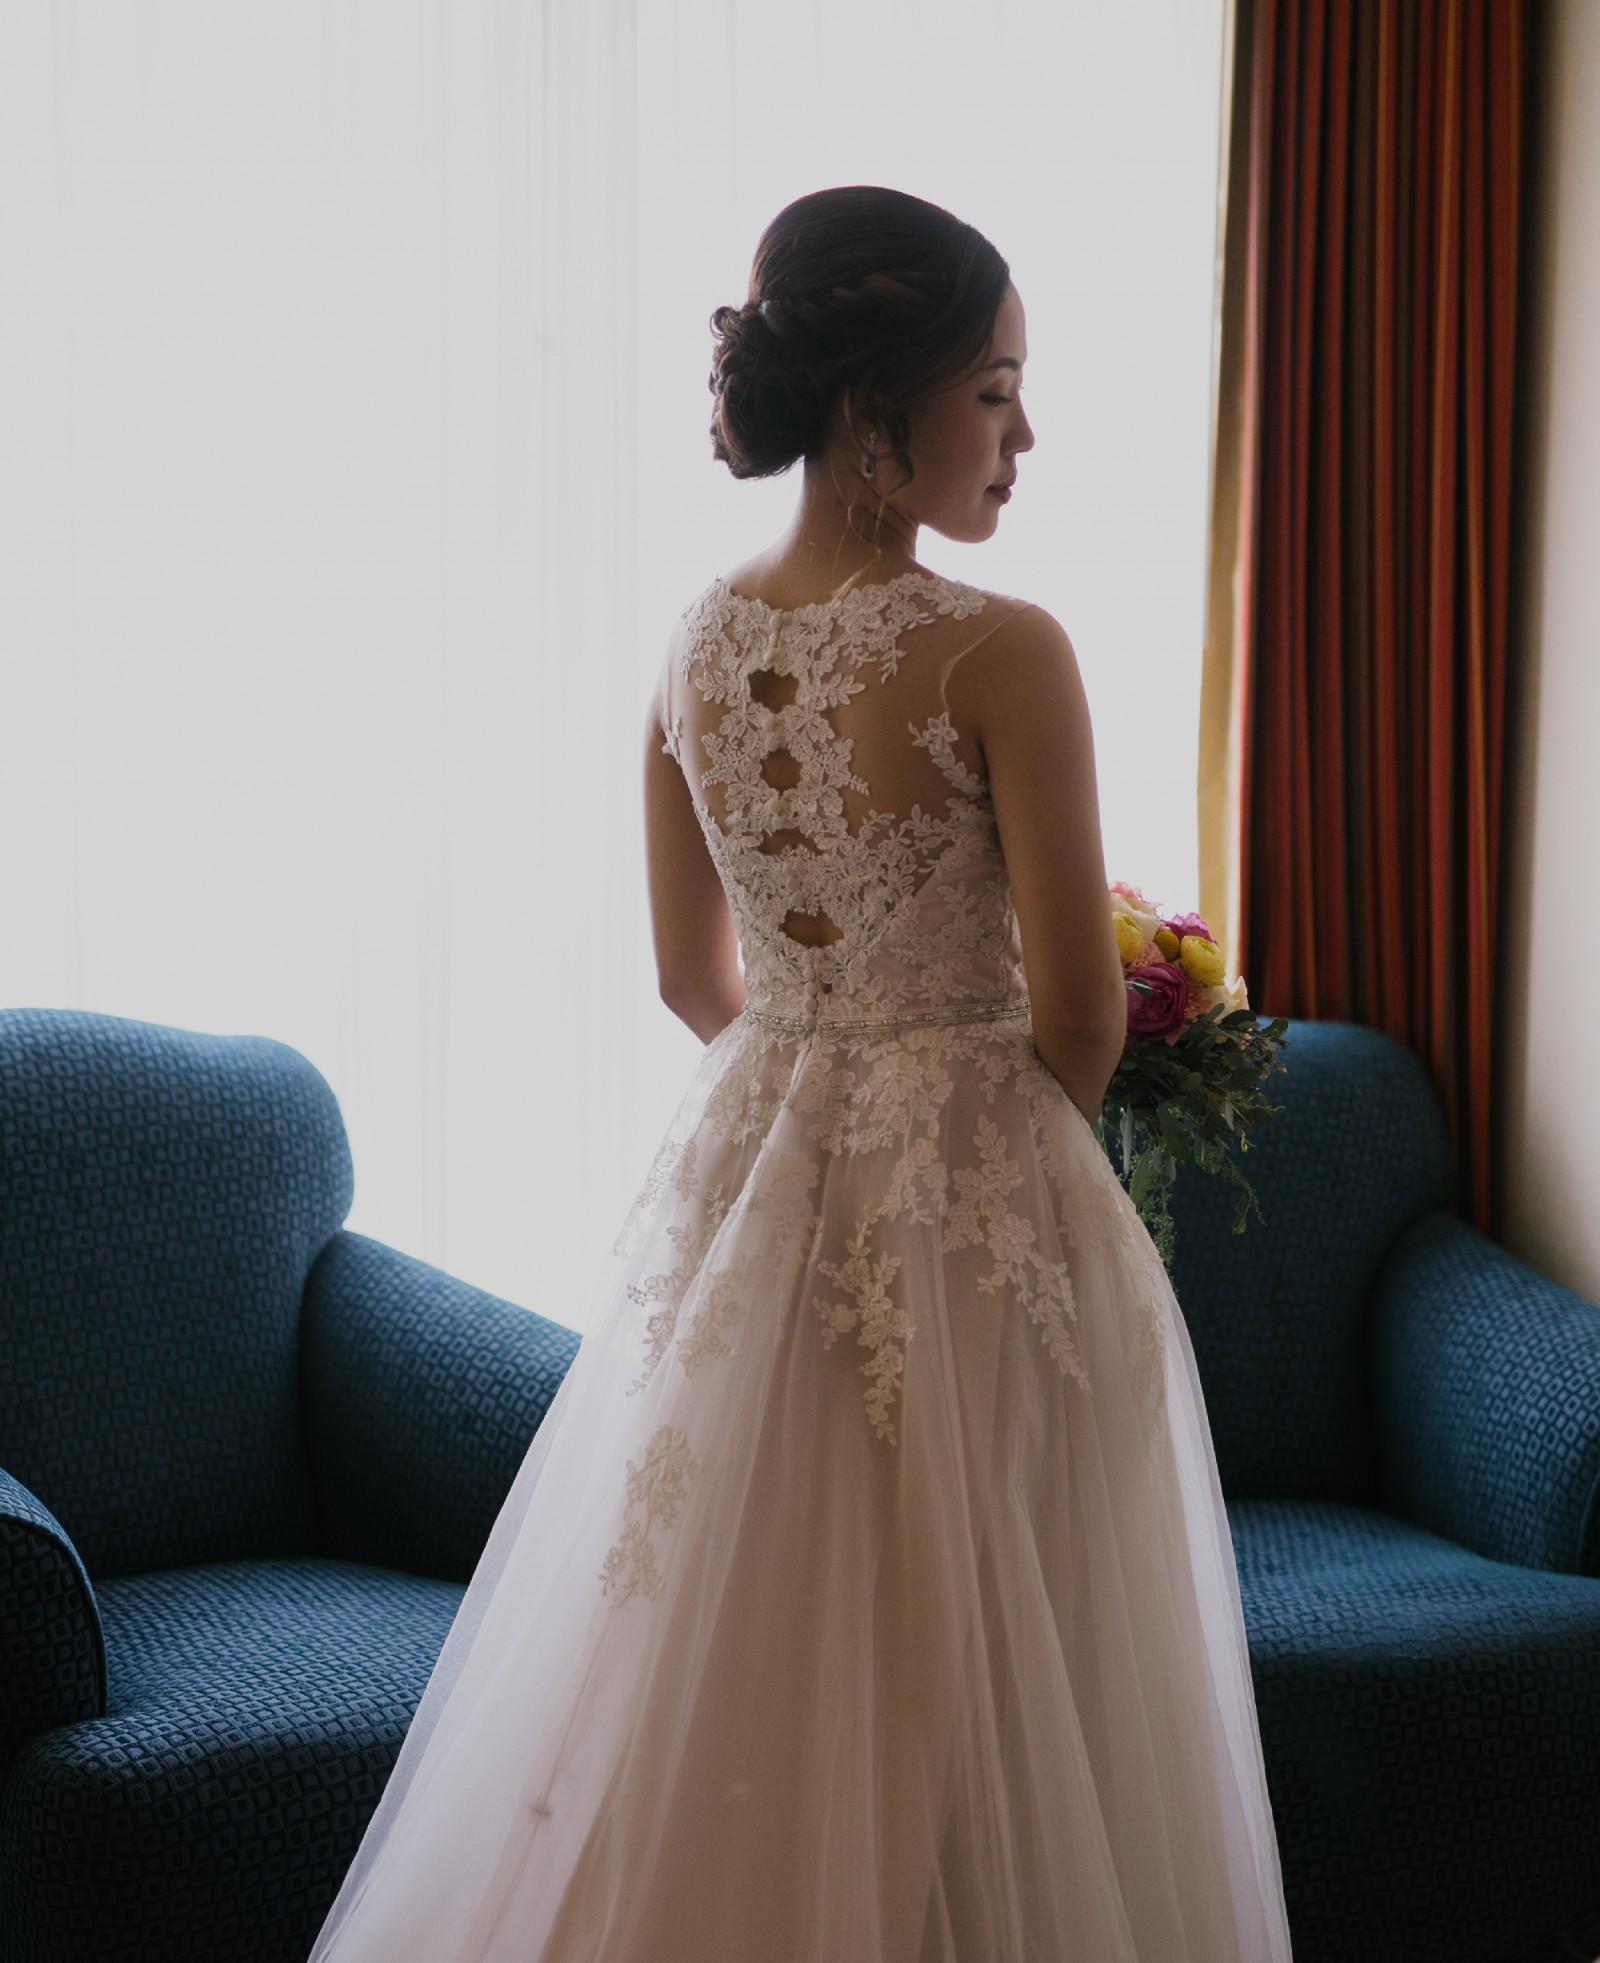 Maggie Sottero Olivia Used Wedding Dress On Sale 31% Off